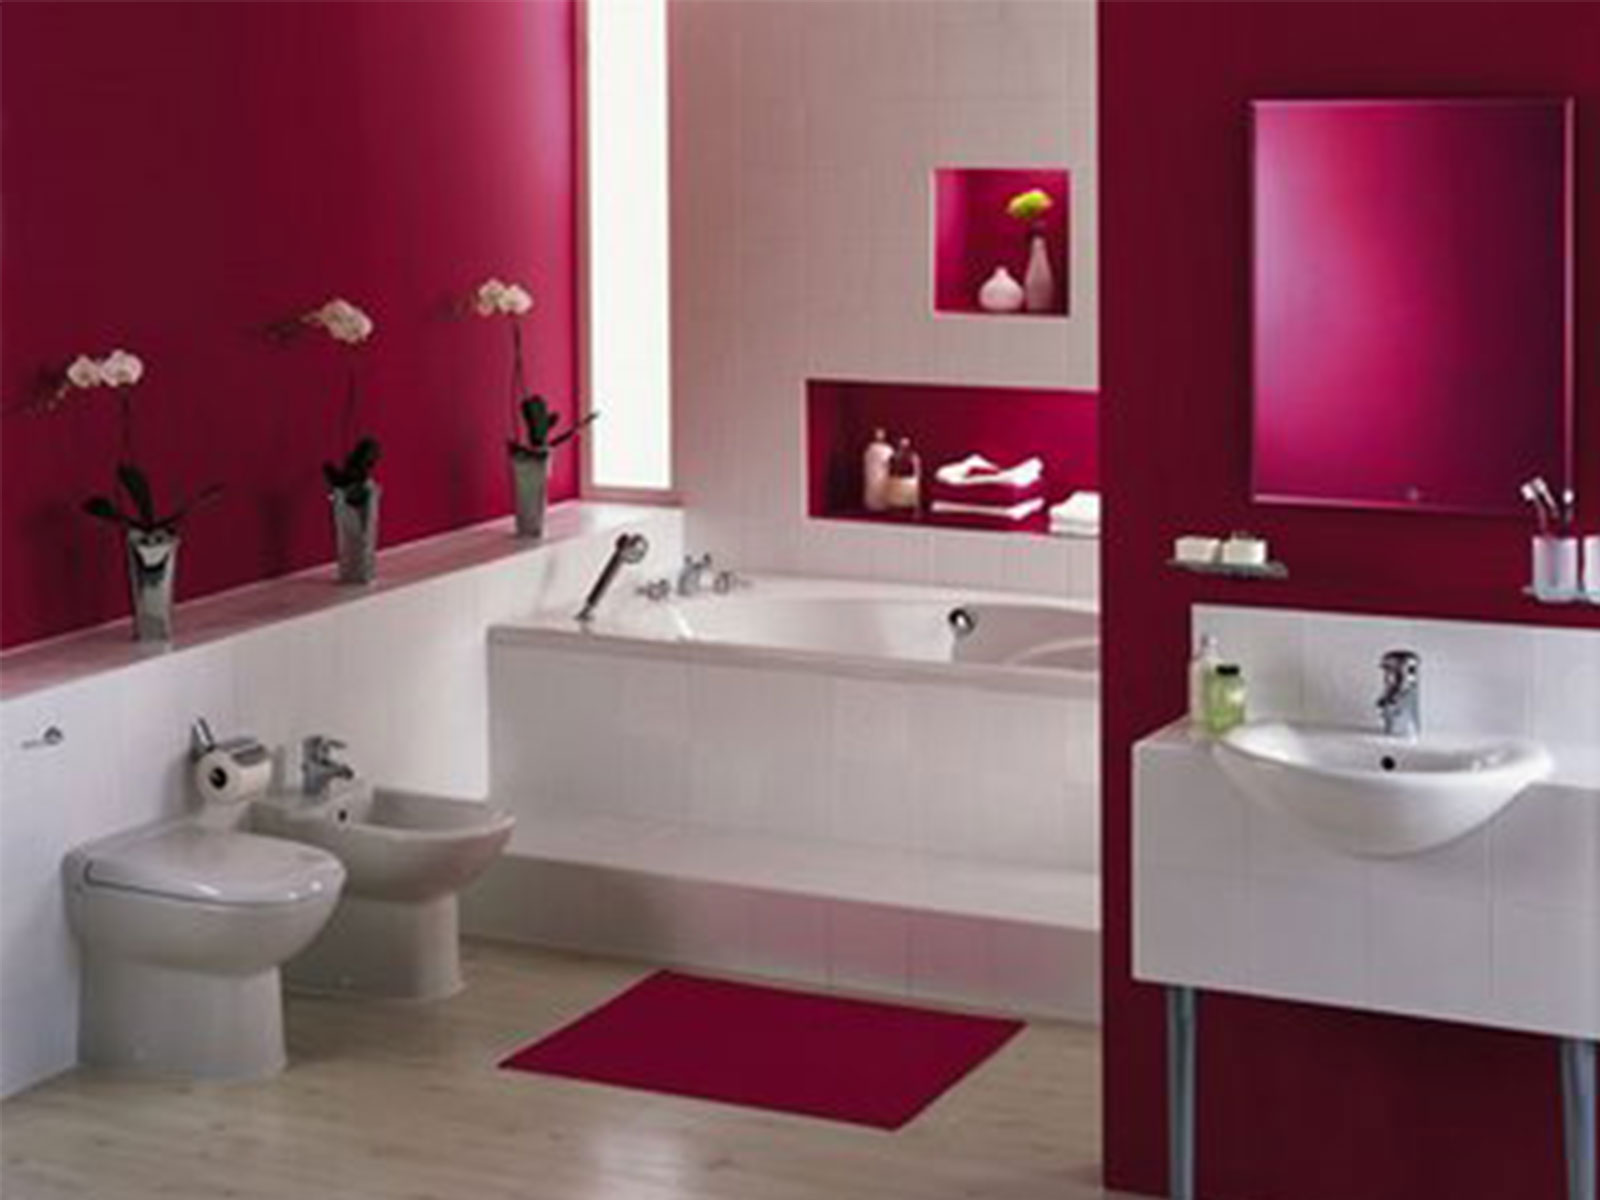 15 New and Unique Kids Bathroom Ideas  Qnud